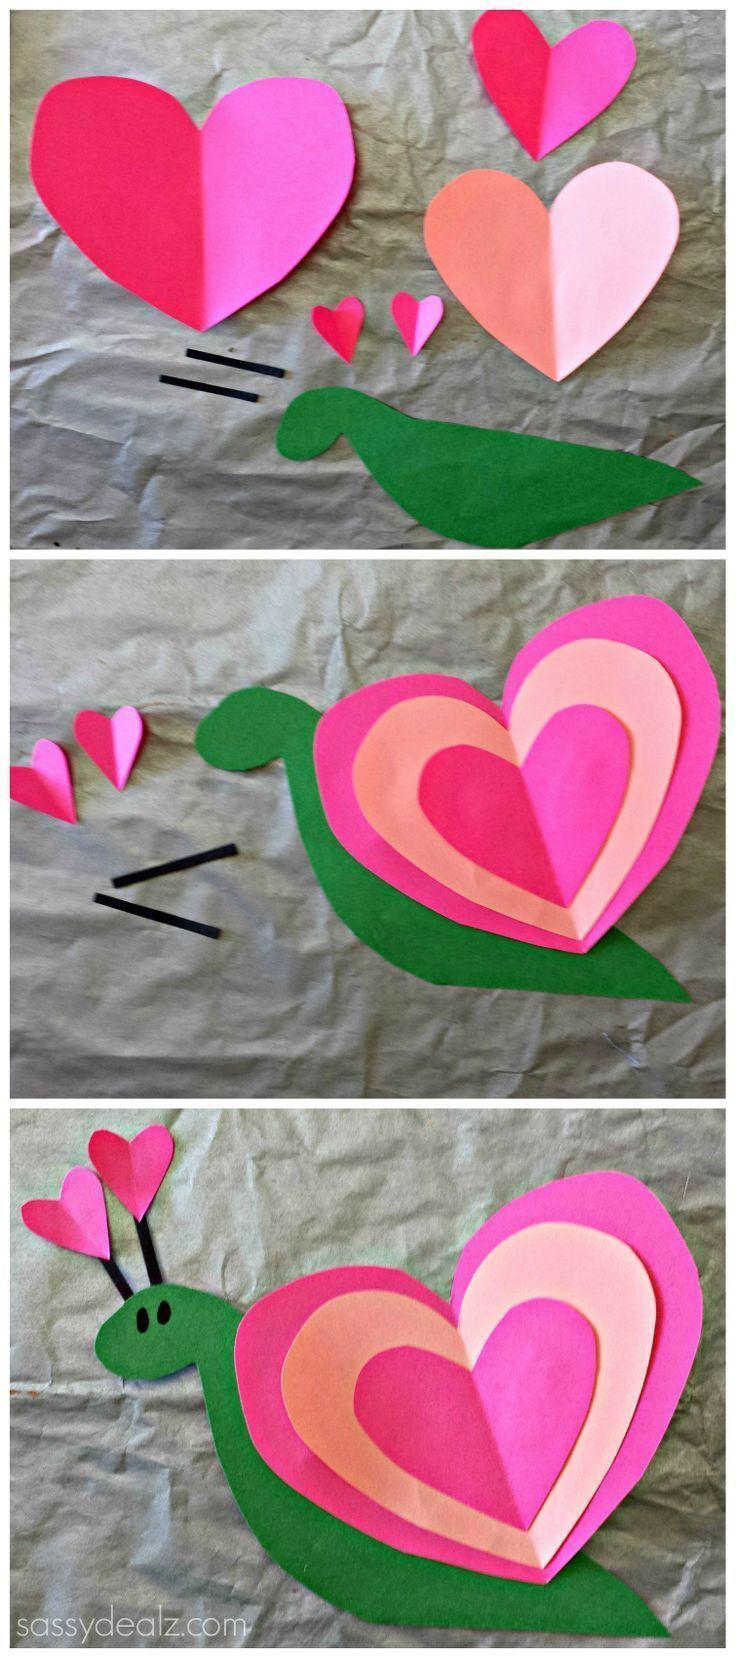 Heart snail craft for kids valentine art project heart shaped heart snail craft for kids valentine art project heart shaped animal diy jeuxipadfo Gallery